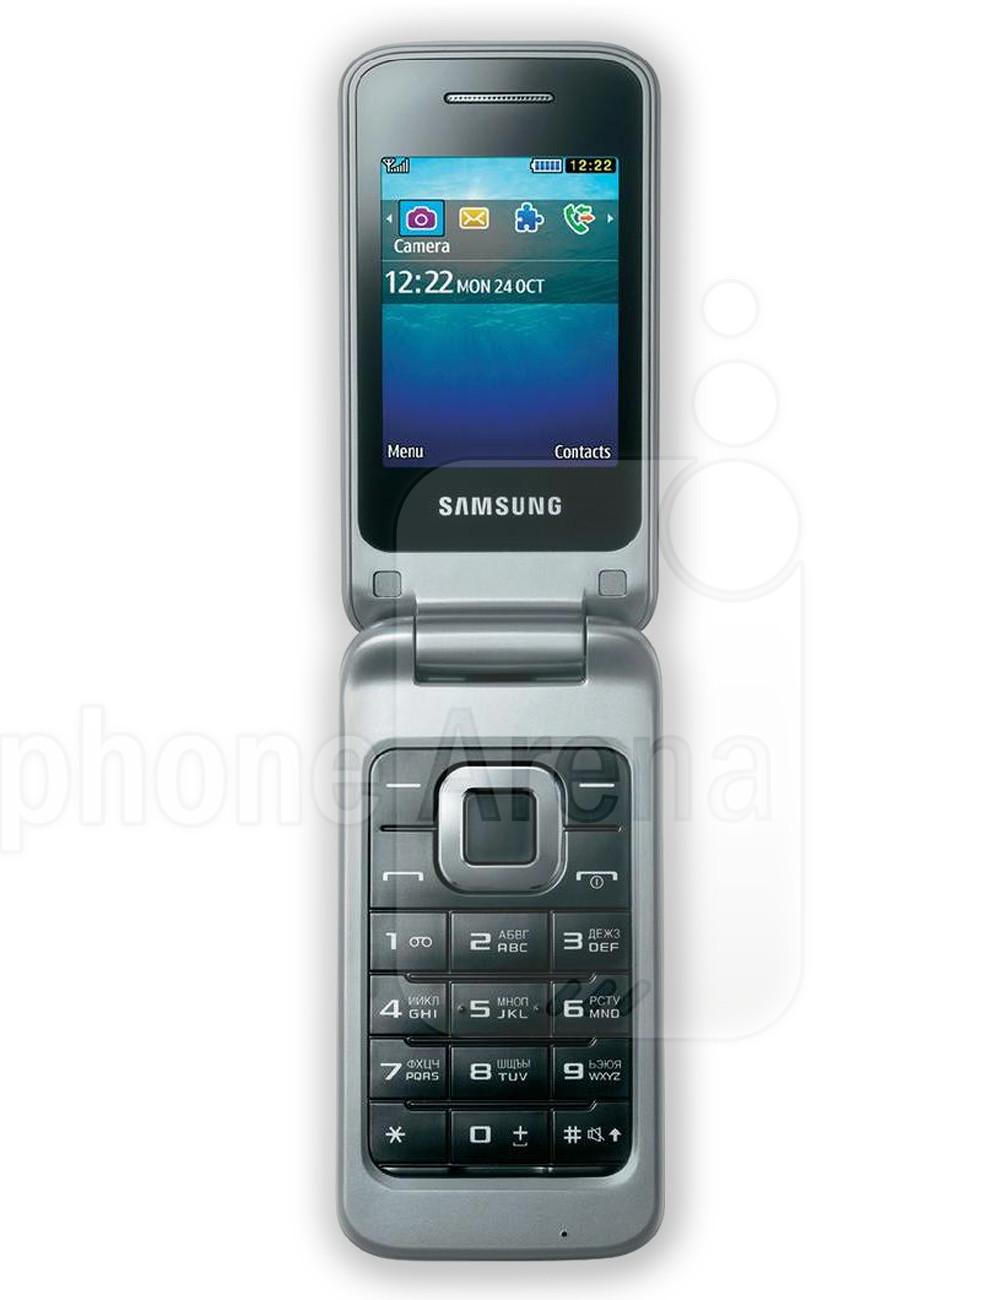 Samsung C3520 specs